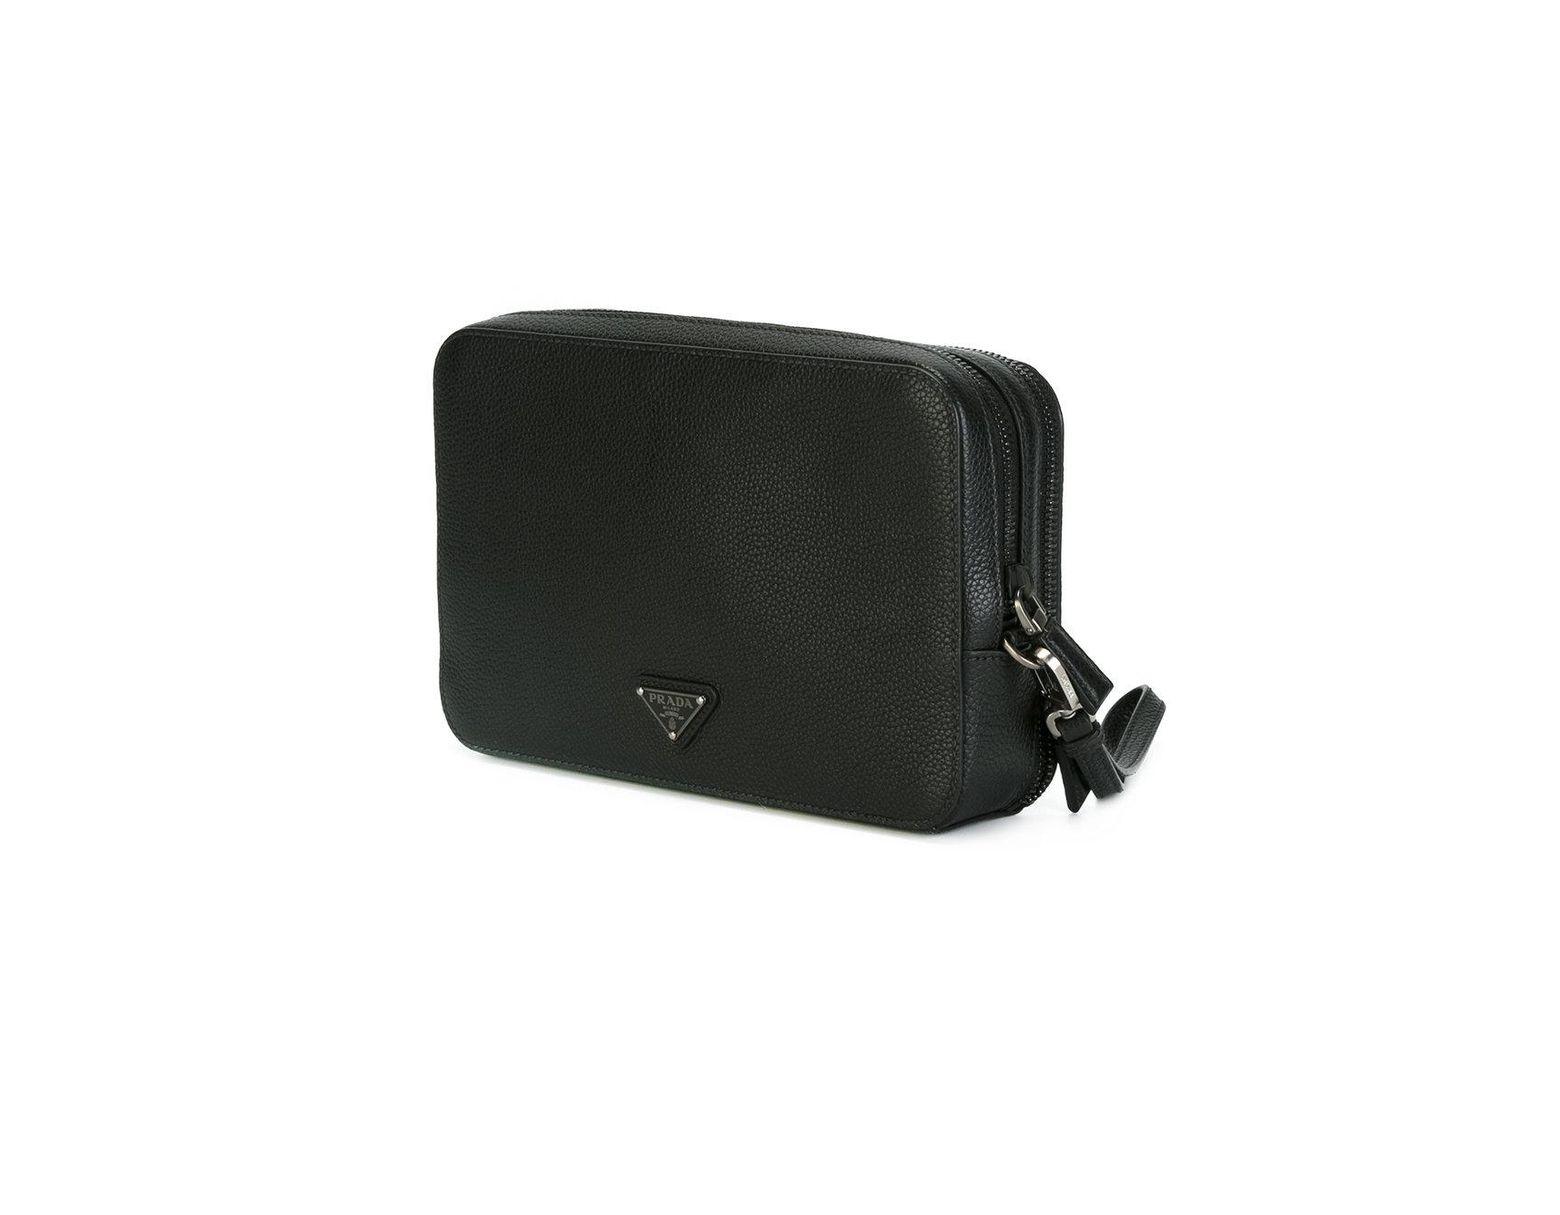 602639a7877f Prada - Hand-strap Clutch - Men - Calf Leather - One Size in Black for Men  - Lyst